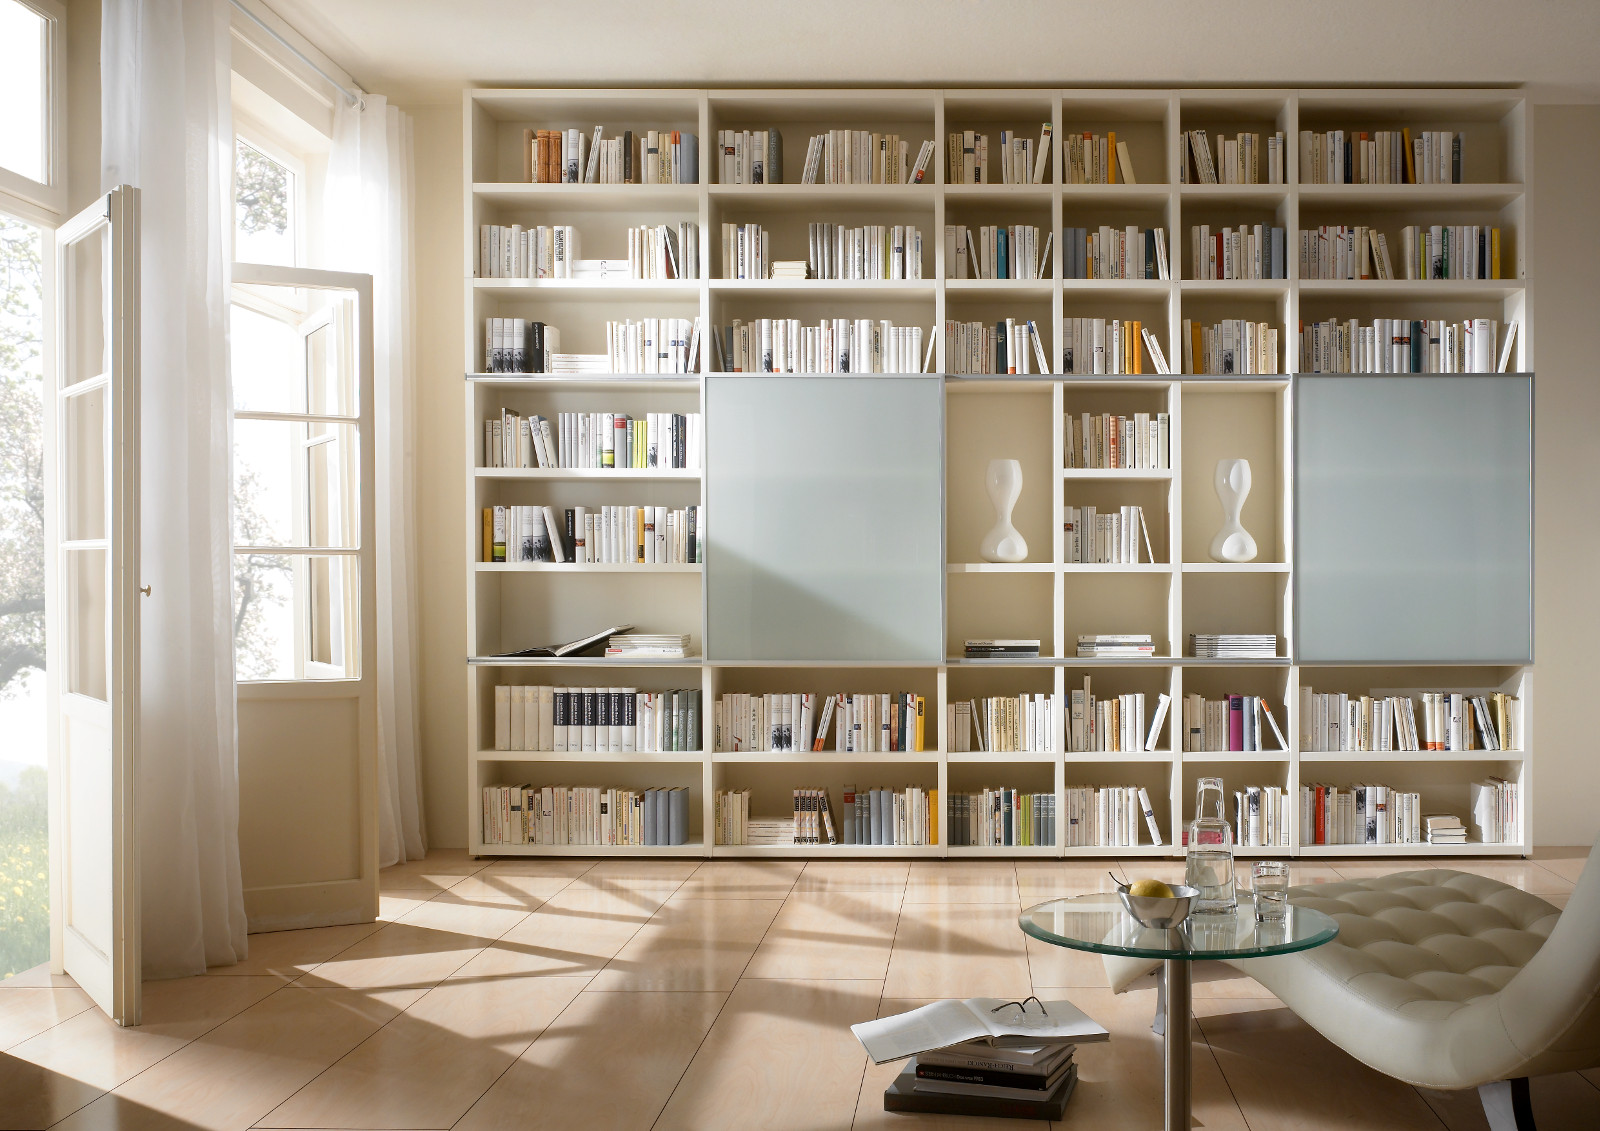 b cherwand regal raumteiler lack wei hochglanz. Black Bedroom Furniture Sets. Home Design Ideas